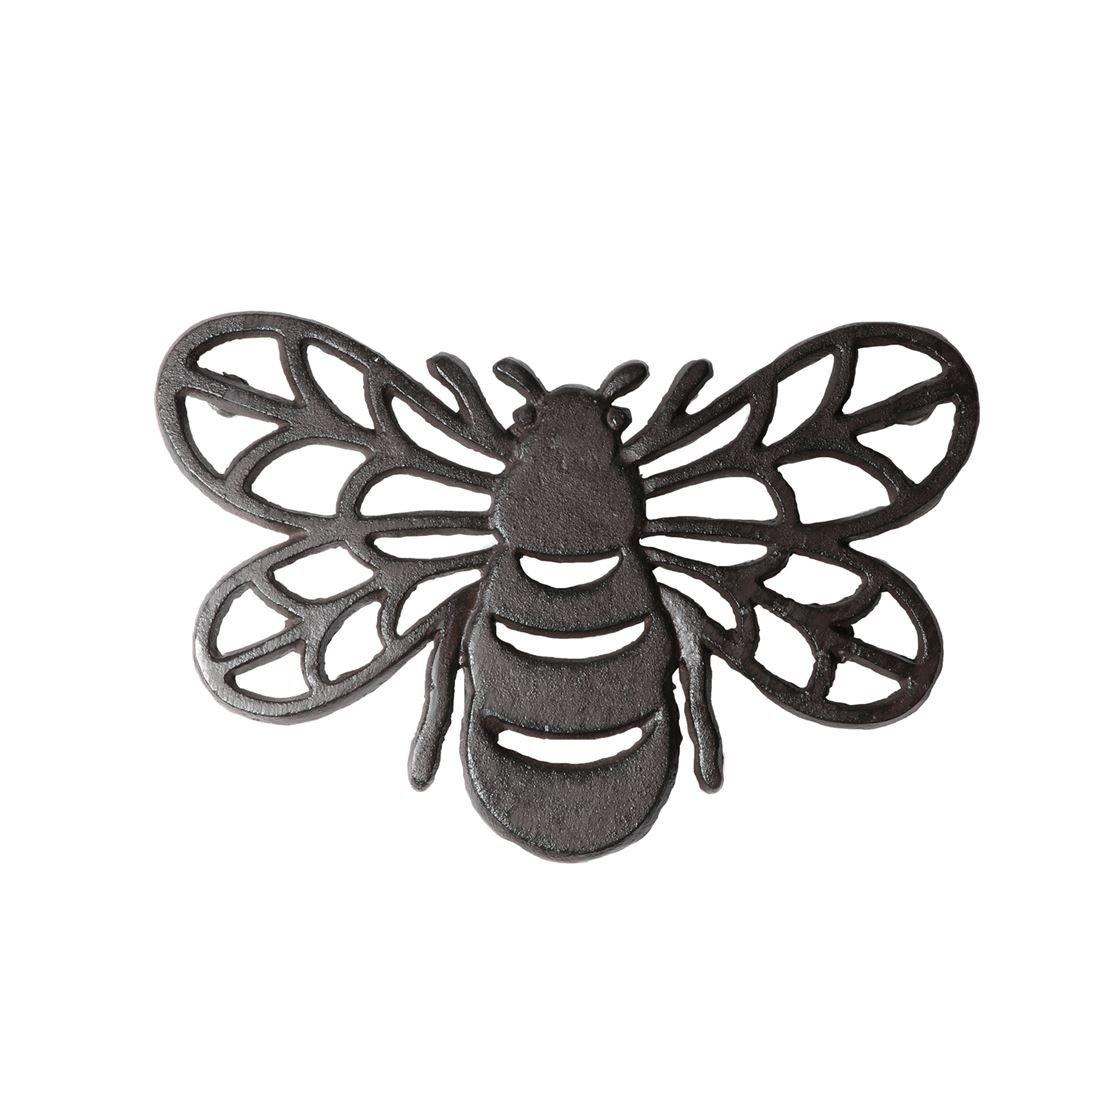 DEI 4.5 Inches x 8 Inches Cast Iron Bee Trivet Kitchen Accessories 10474